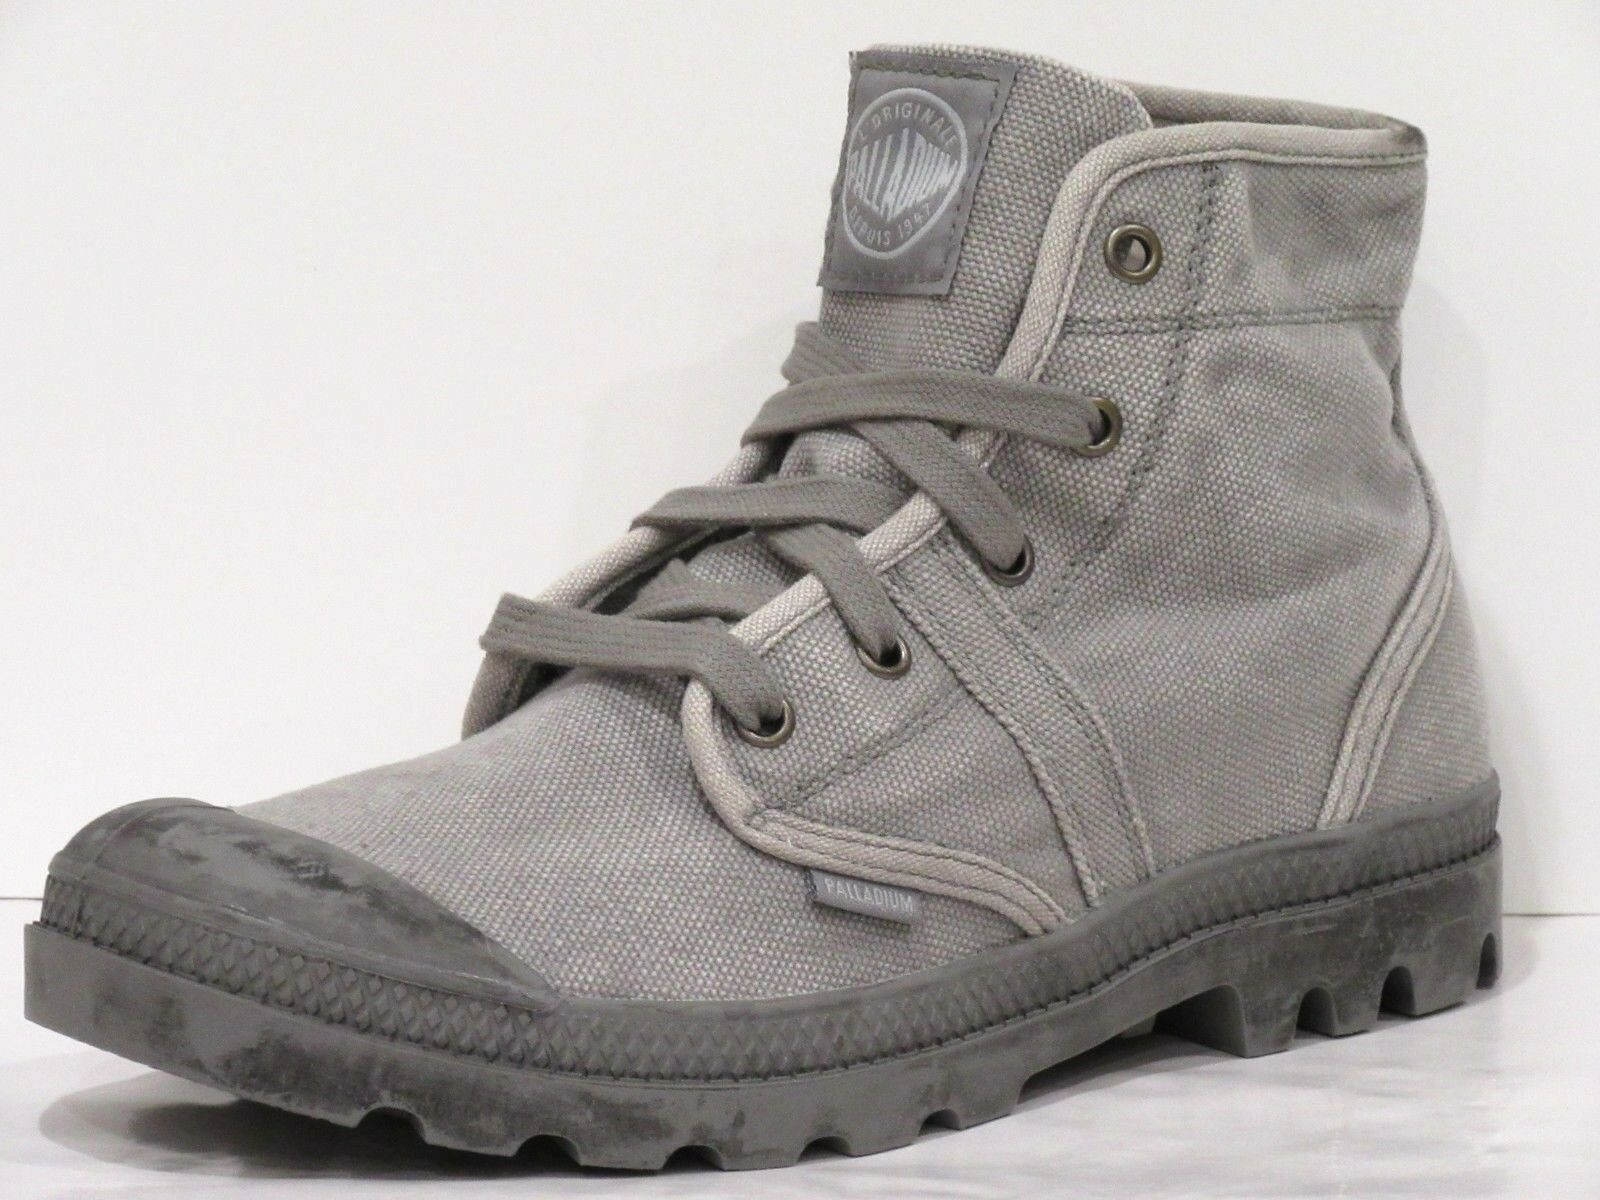 Palladium Women's Pallabrouse Boot  (9 M US)